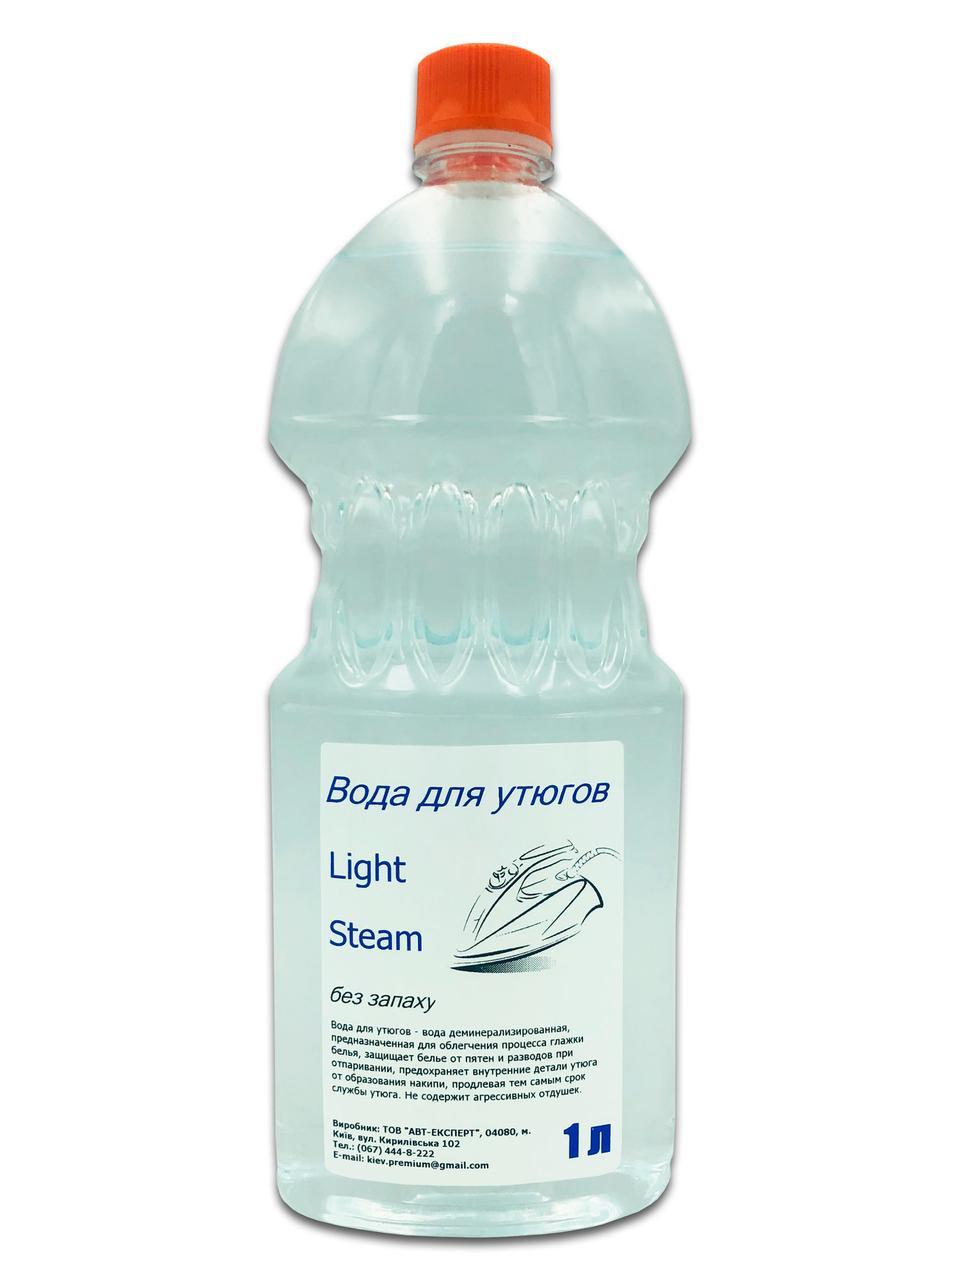 Вода для утюгов Light Steam 1 л